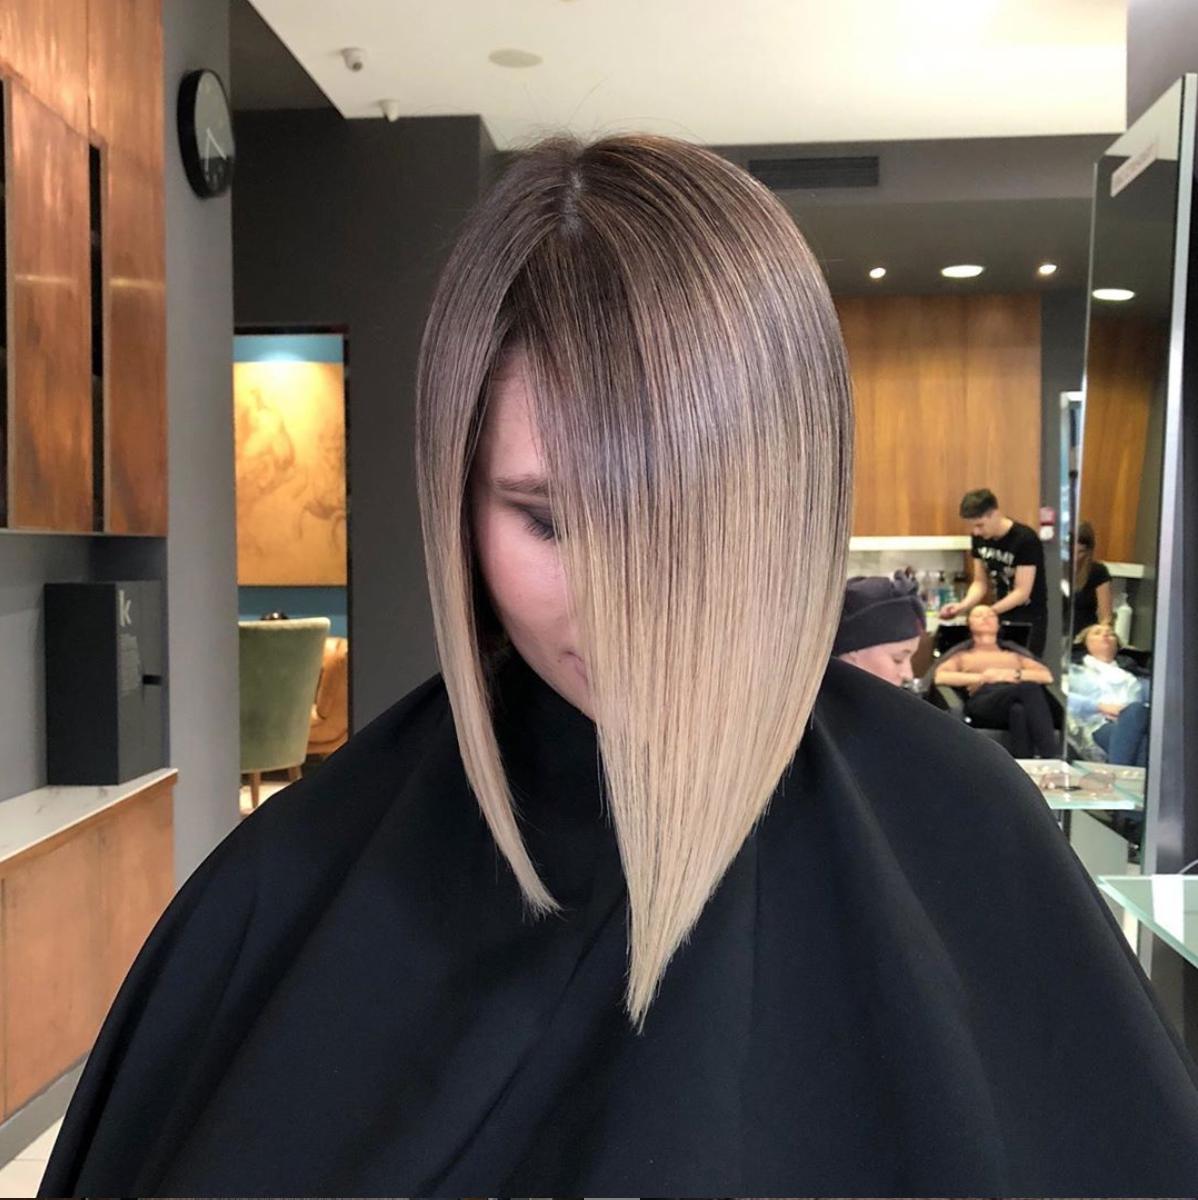 Técnica AirTouch en cabello corto y tonos avellana